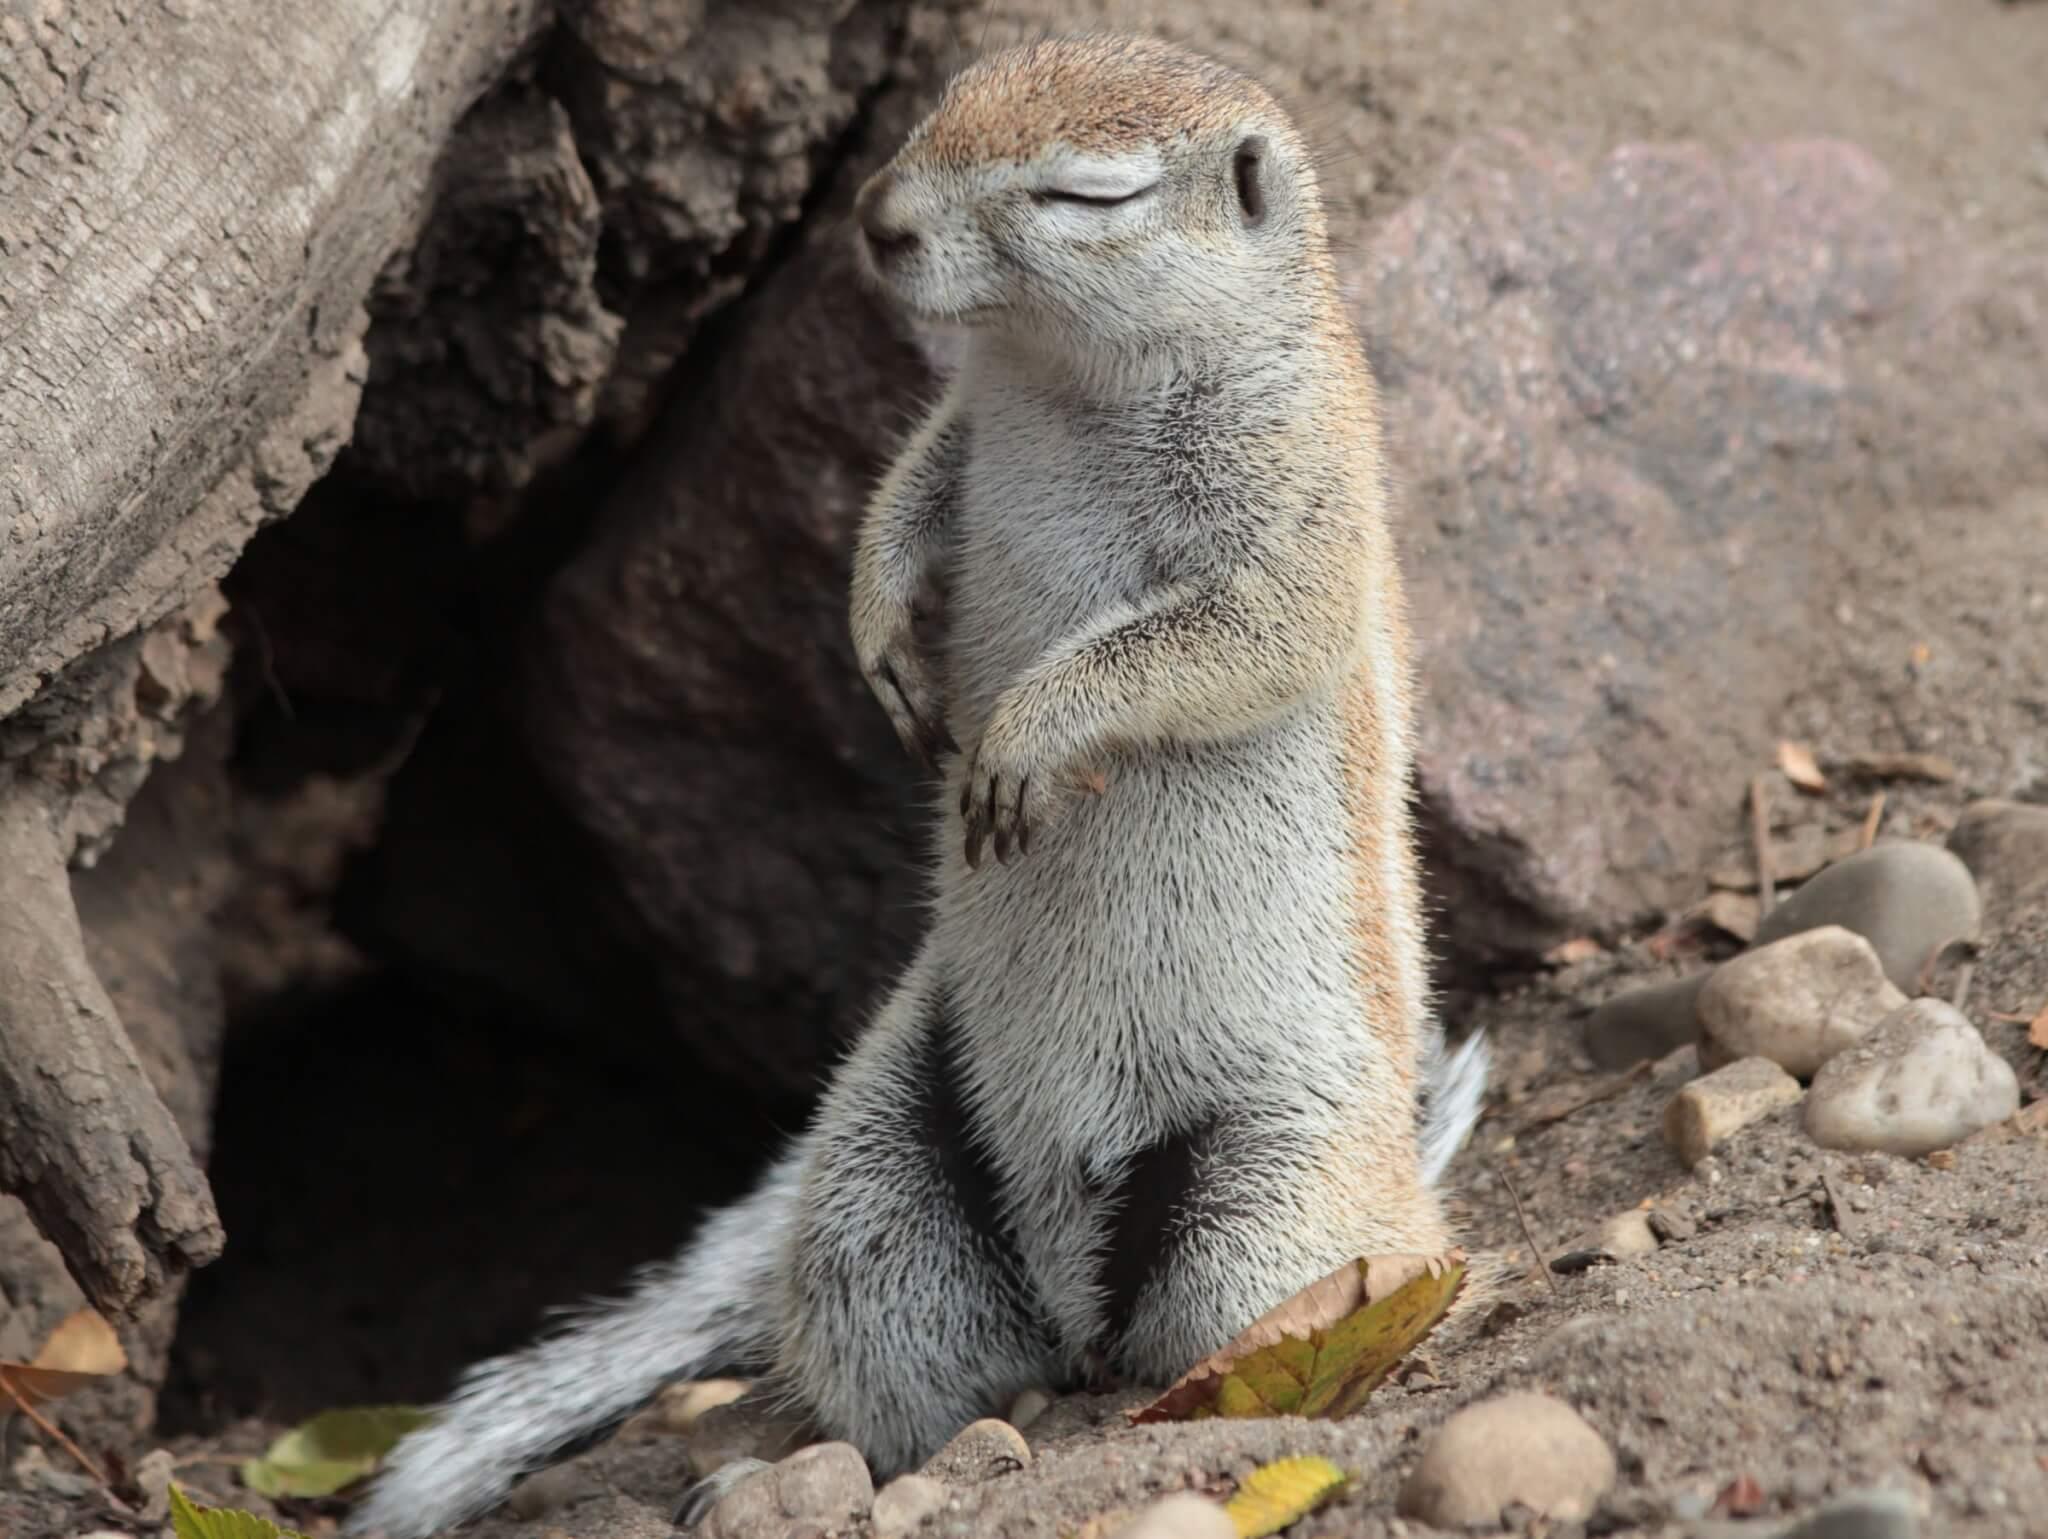 Neuankünfte Im Bergzoo – Kap Borstenhörnchen